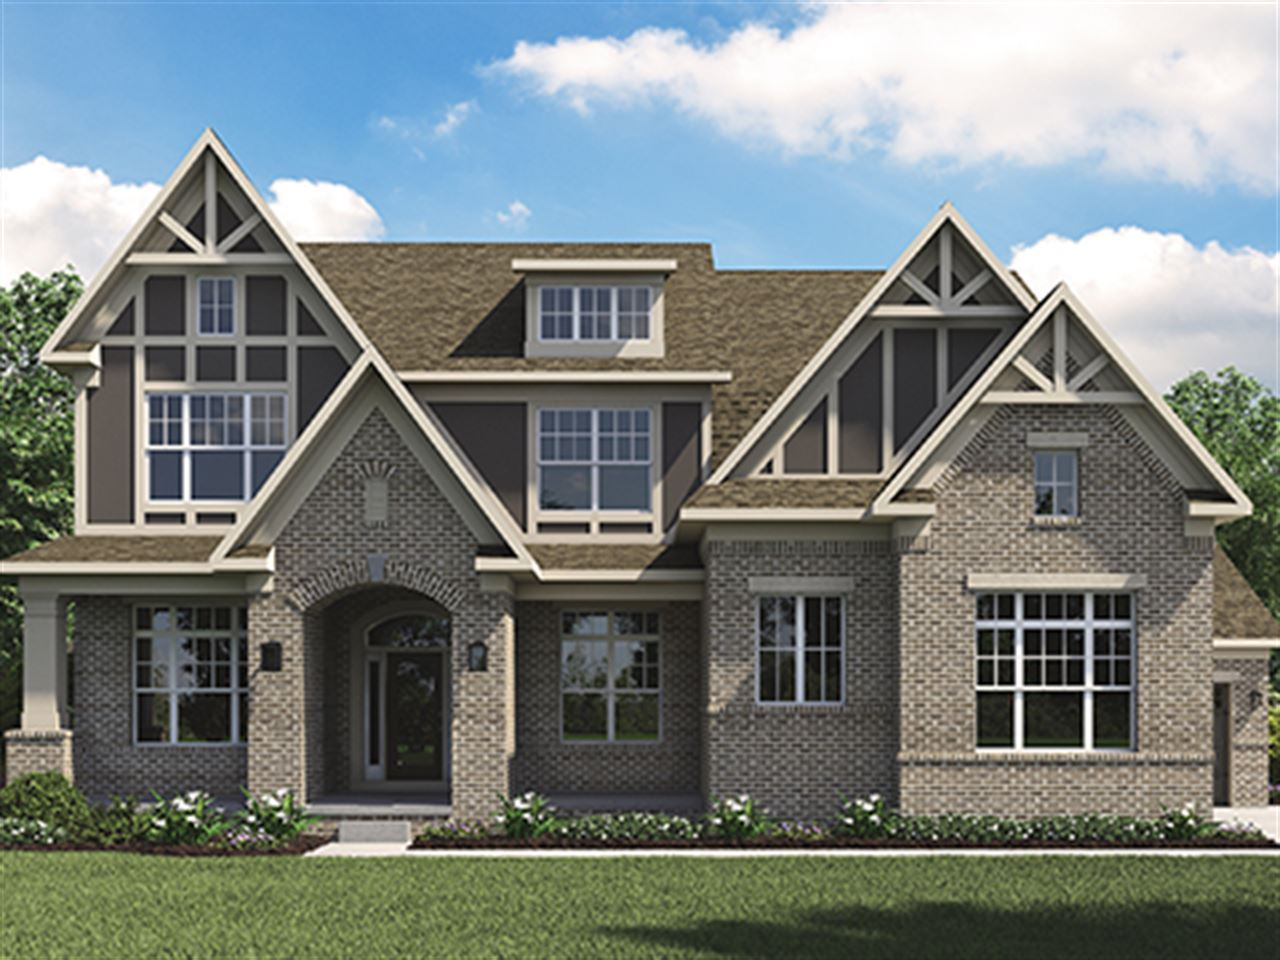 16291 KENORA LANE NORTH, Fishers, IN Homes & Land - Real Estate